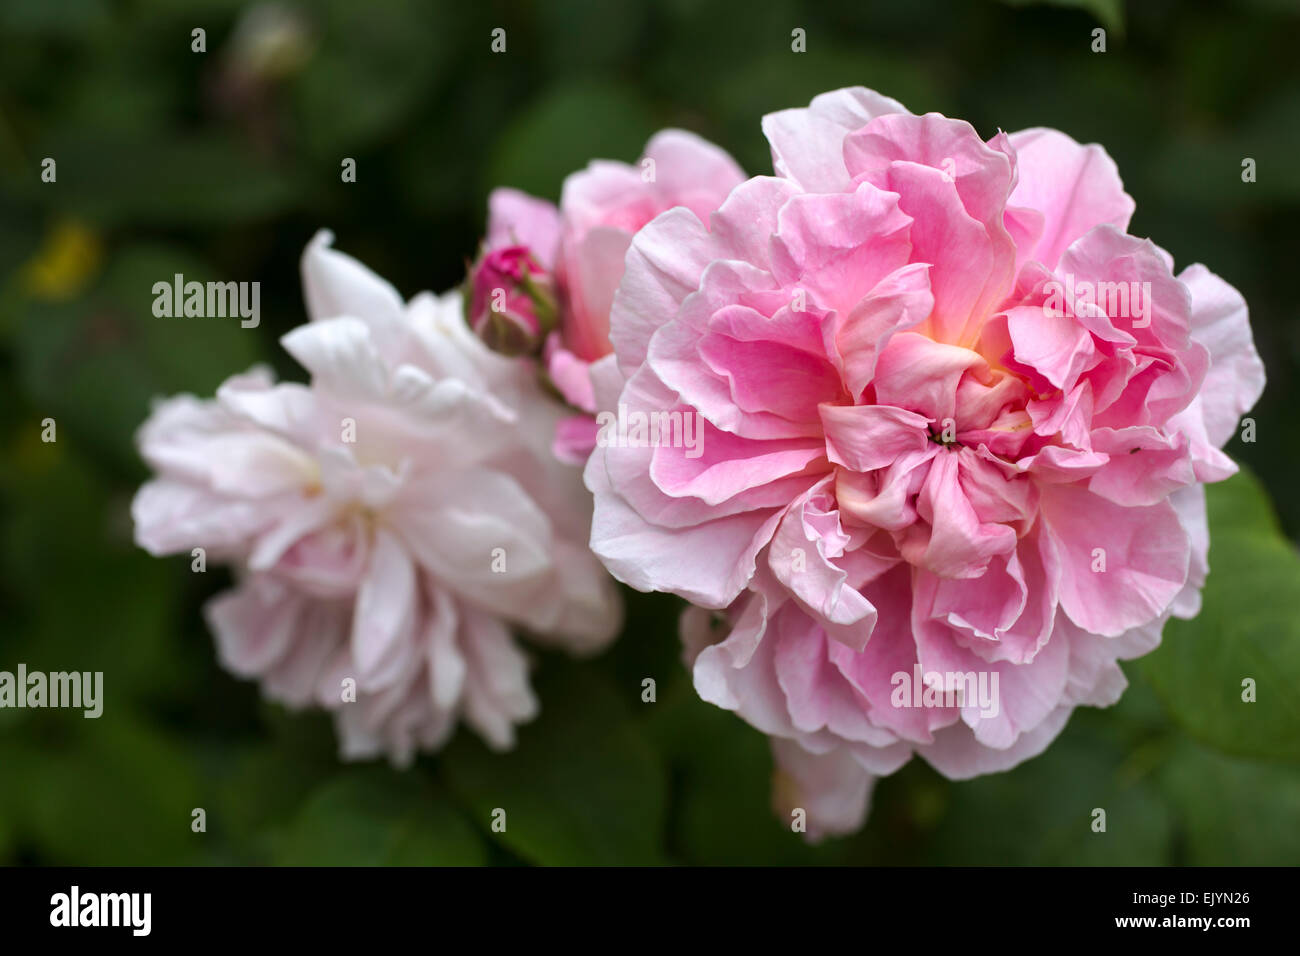 Fine Rosa Cottage Rose Shrub Rose David Austin English Rose Download Free Architecture Designs Intelgarnamadebymaigaardcom